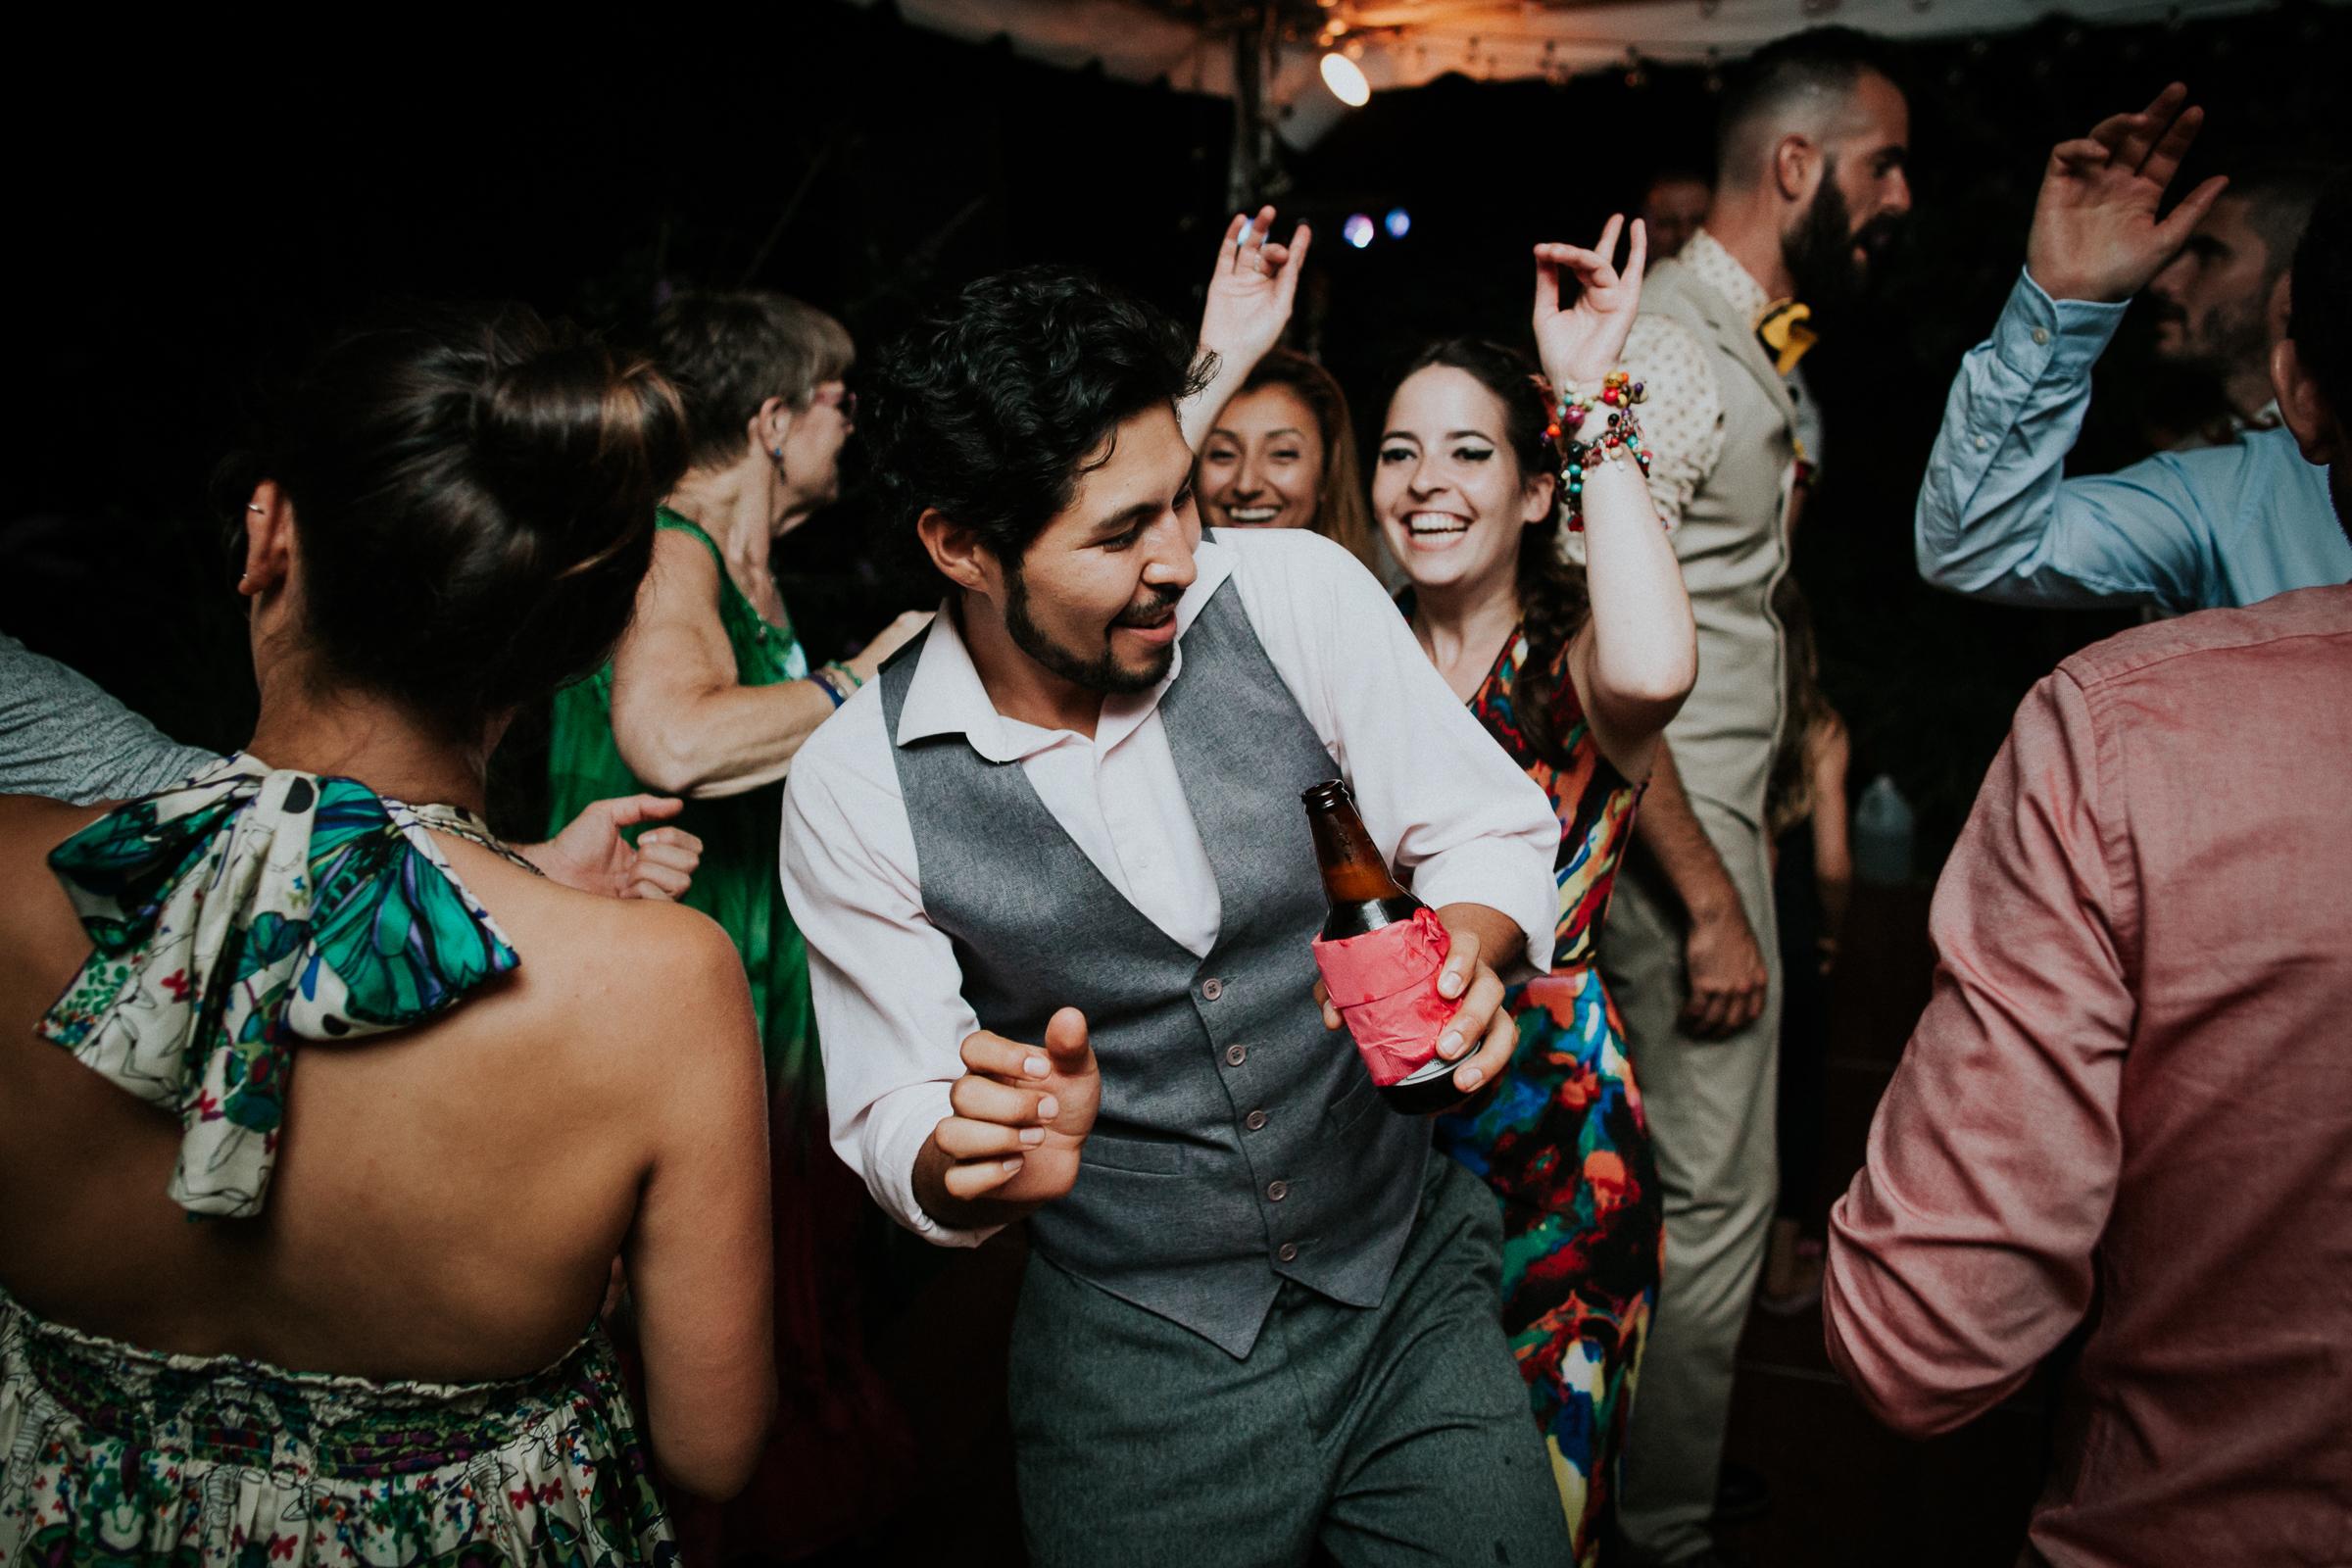 Backyard-Intimate-Adventurous-Destination-Wedding-Darien-Connecticut-Documentary-Wedding-Photography-133.jpg